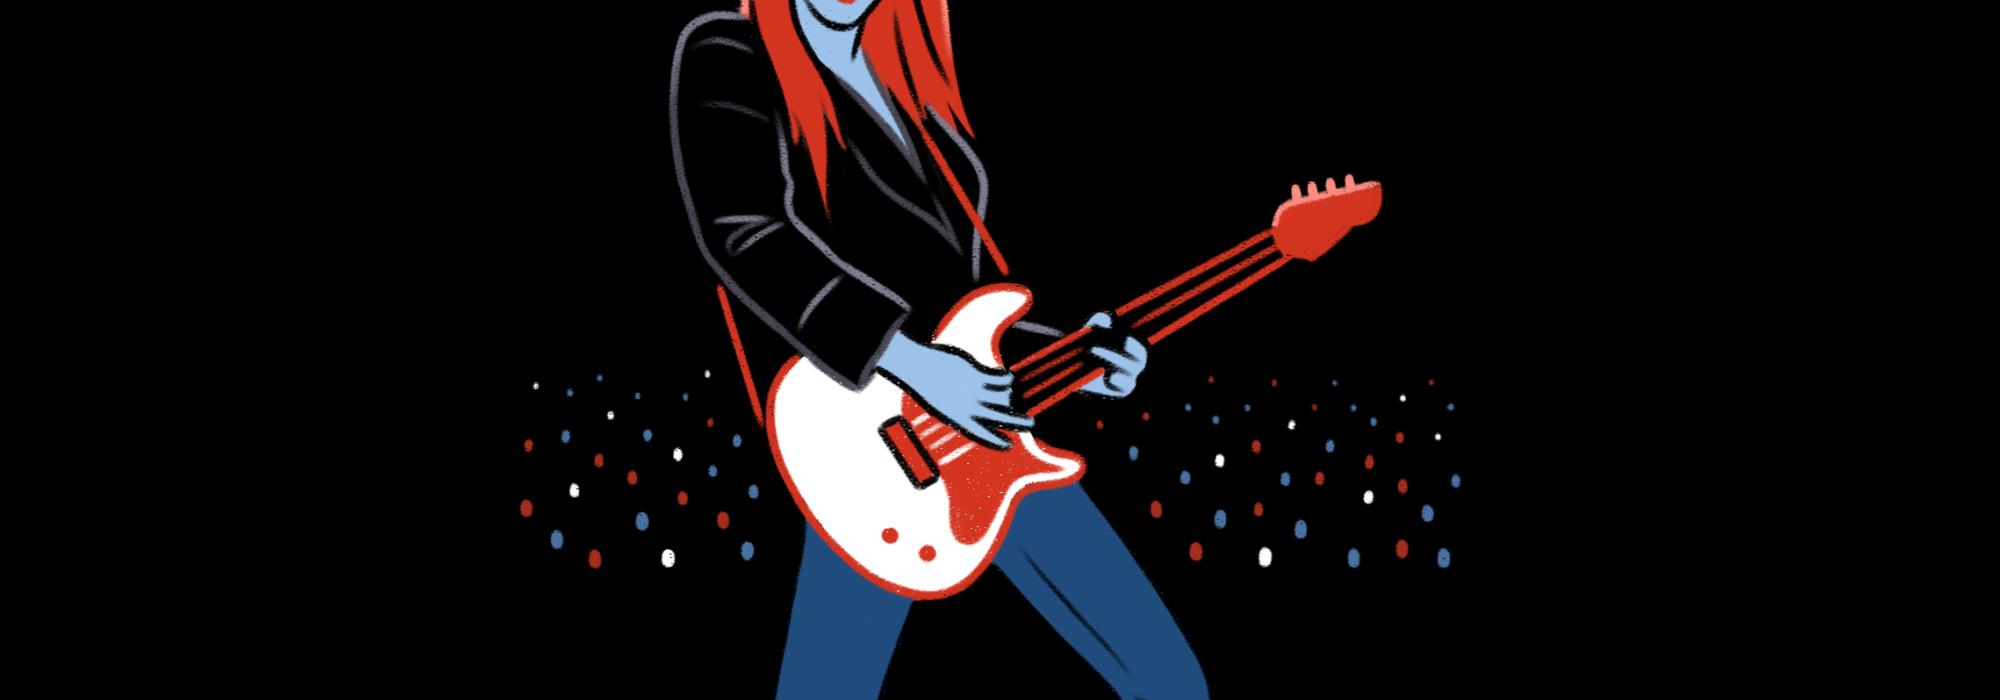 A 22Gz live event